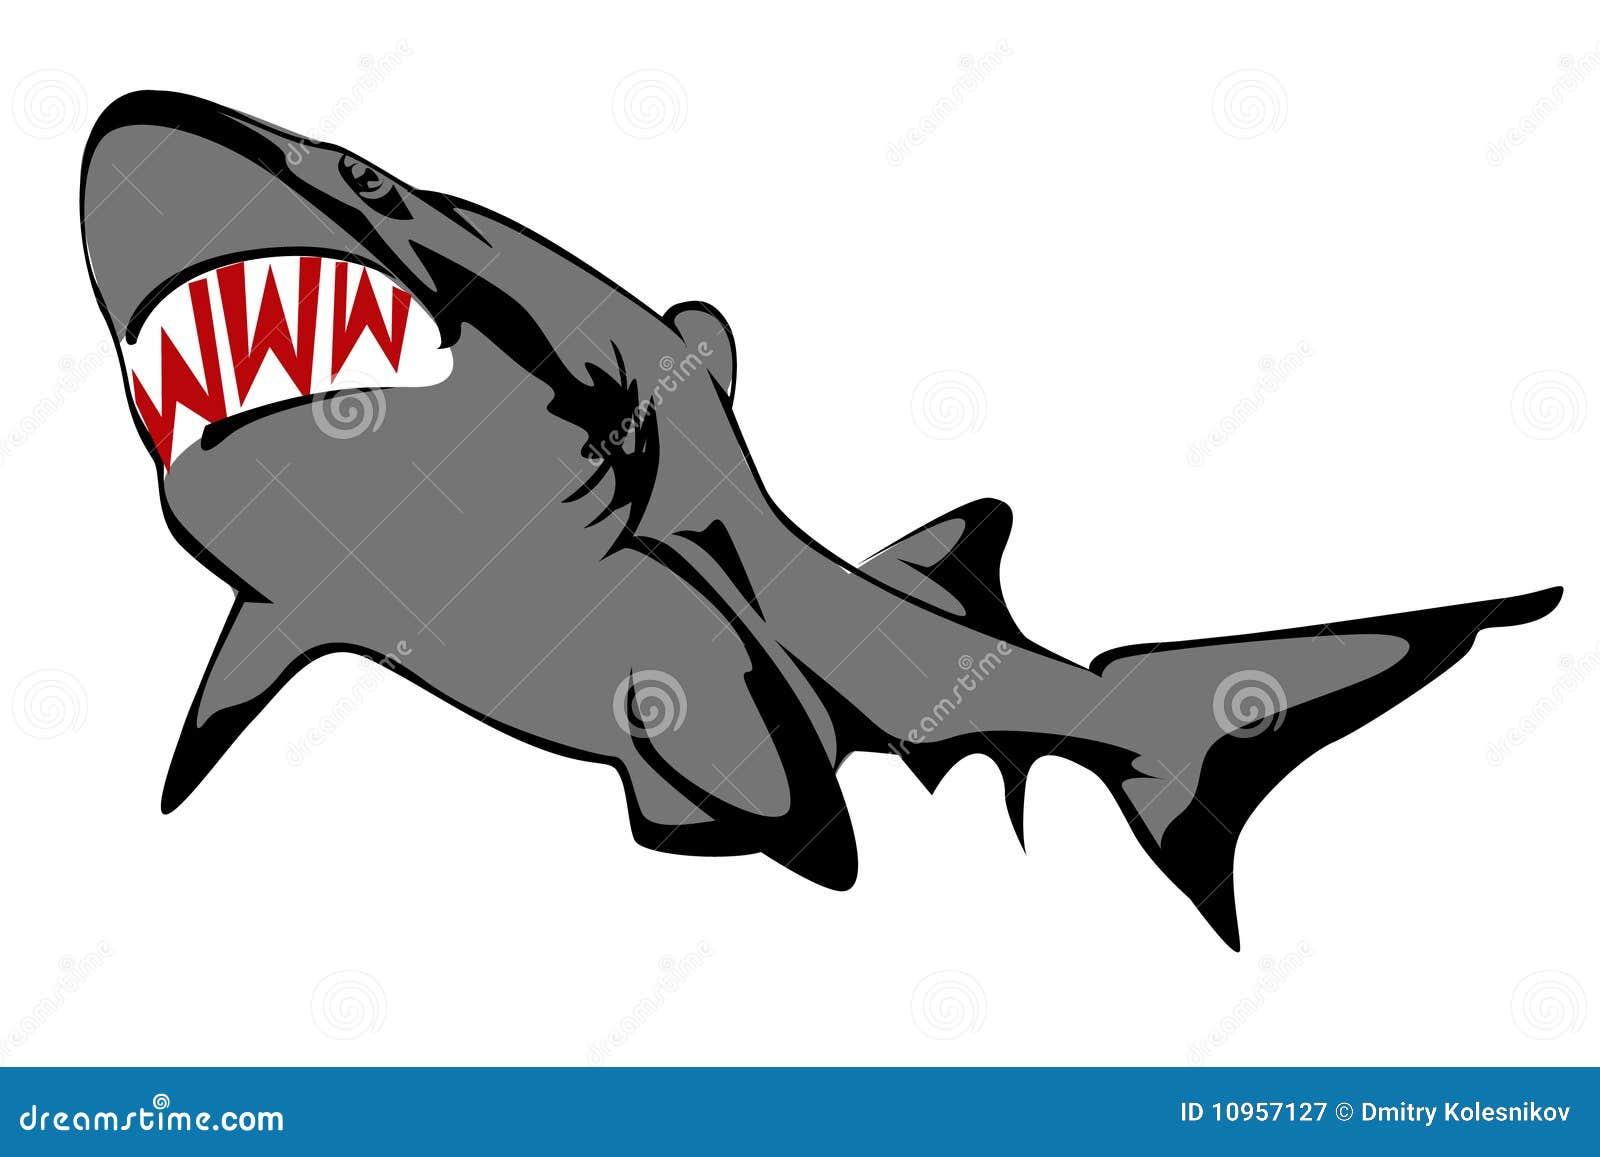 shark fin white background - photo #19